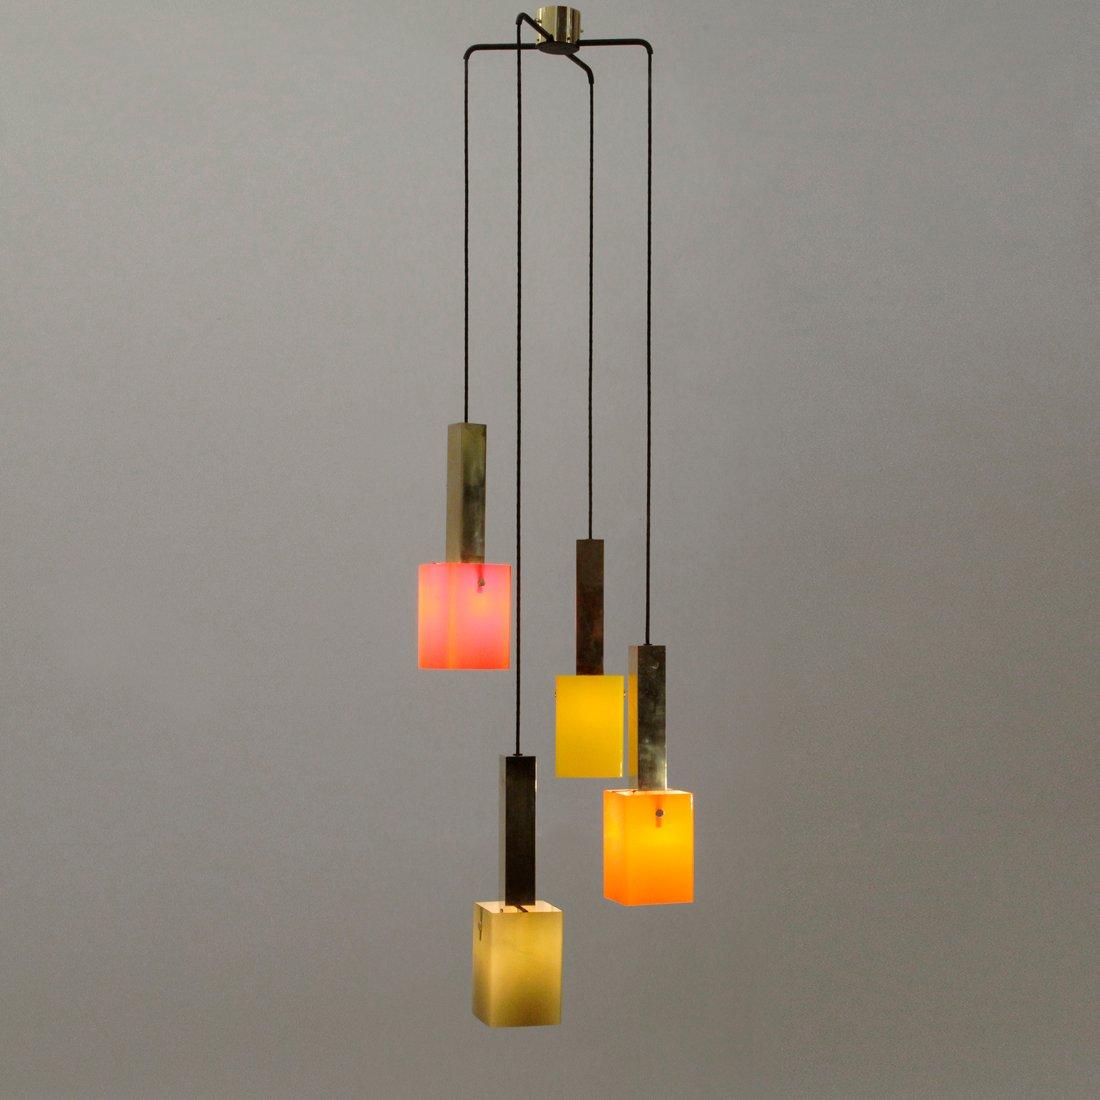 kronleuchter aus messing glas von stilnovo 1950er bei. Black Bedroom Furniture Sets. Home Design Ideas